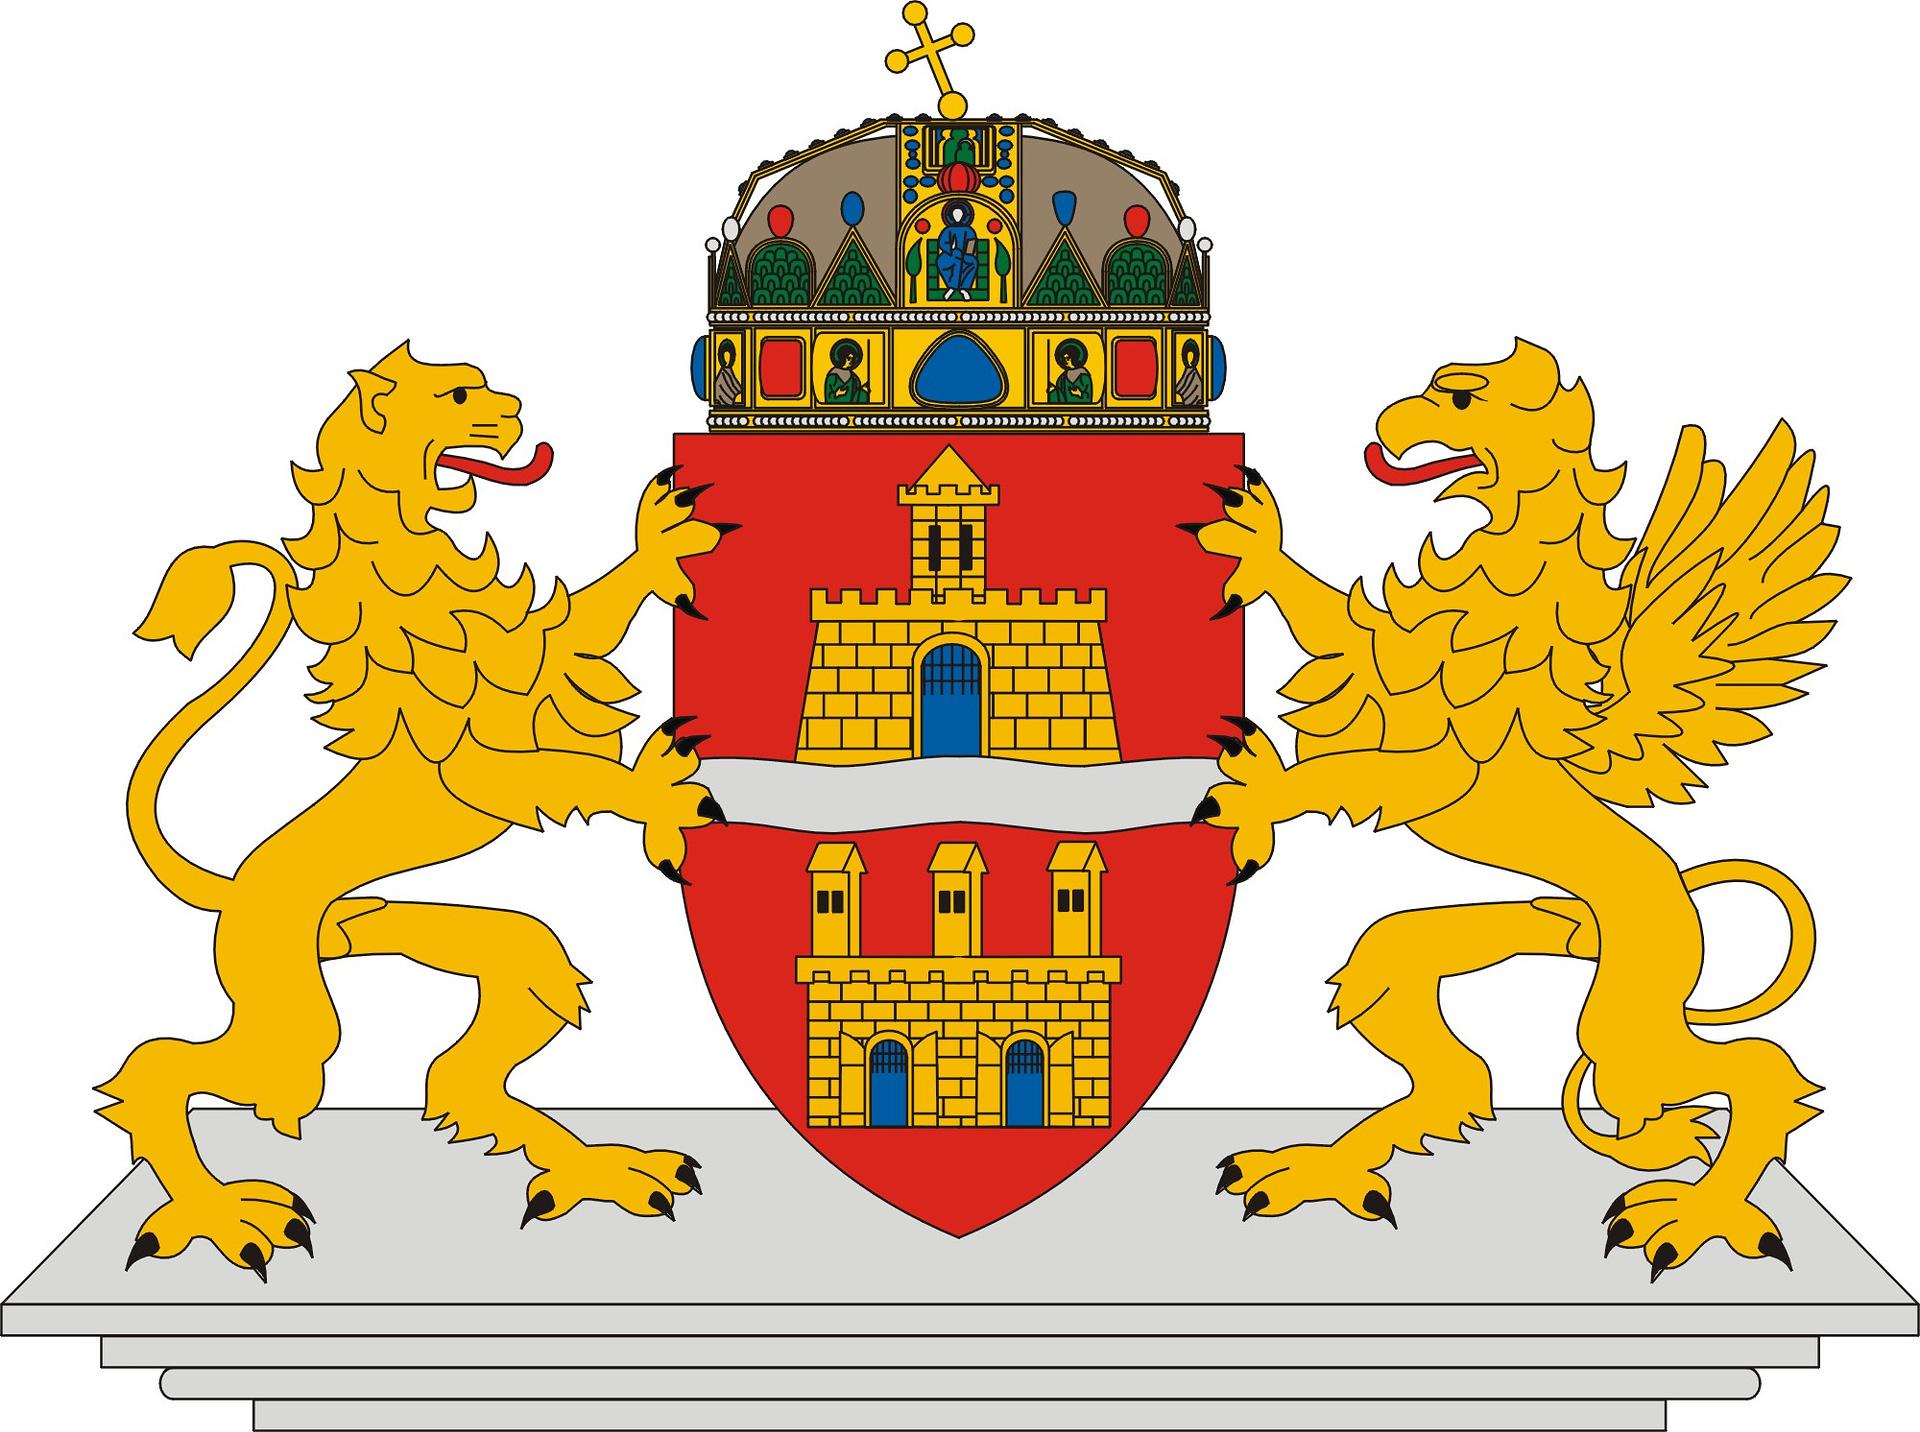 Okospad Budapest